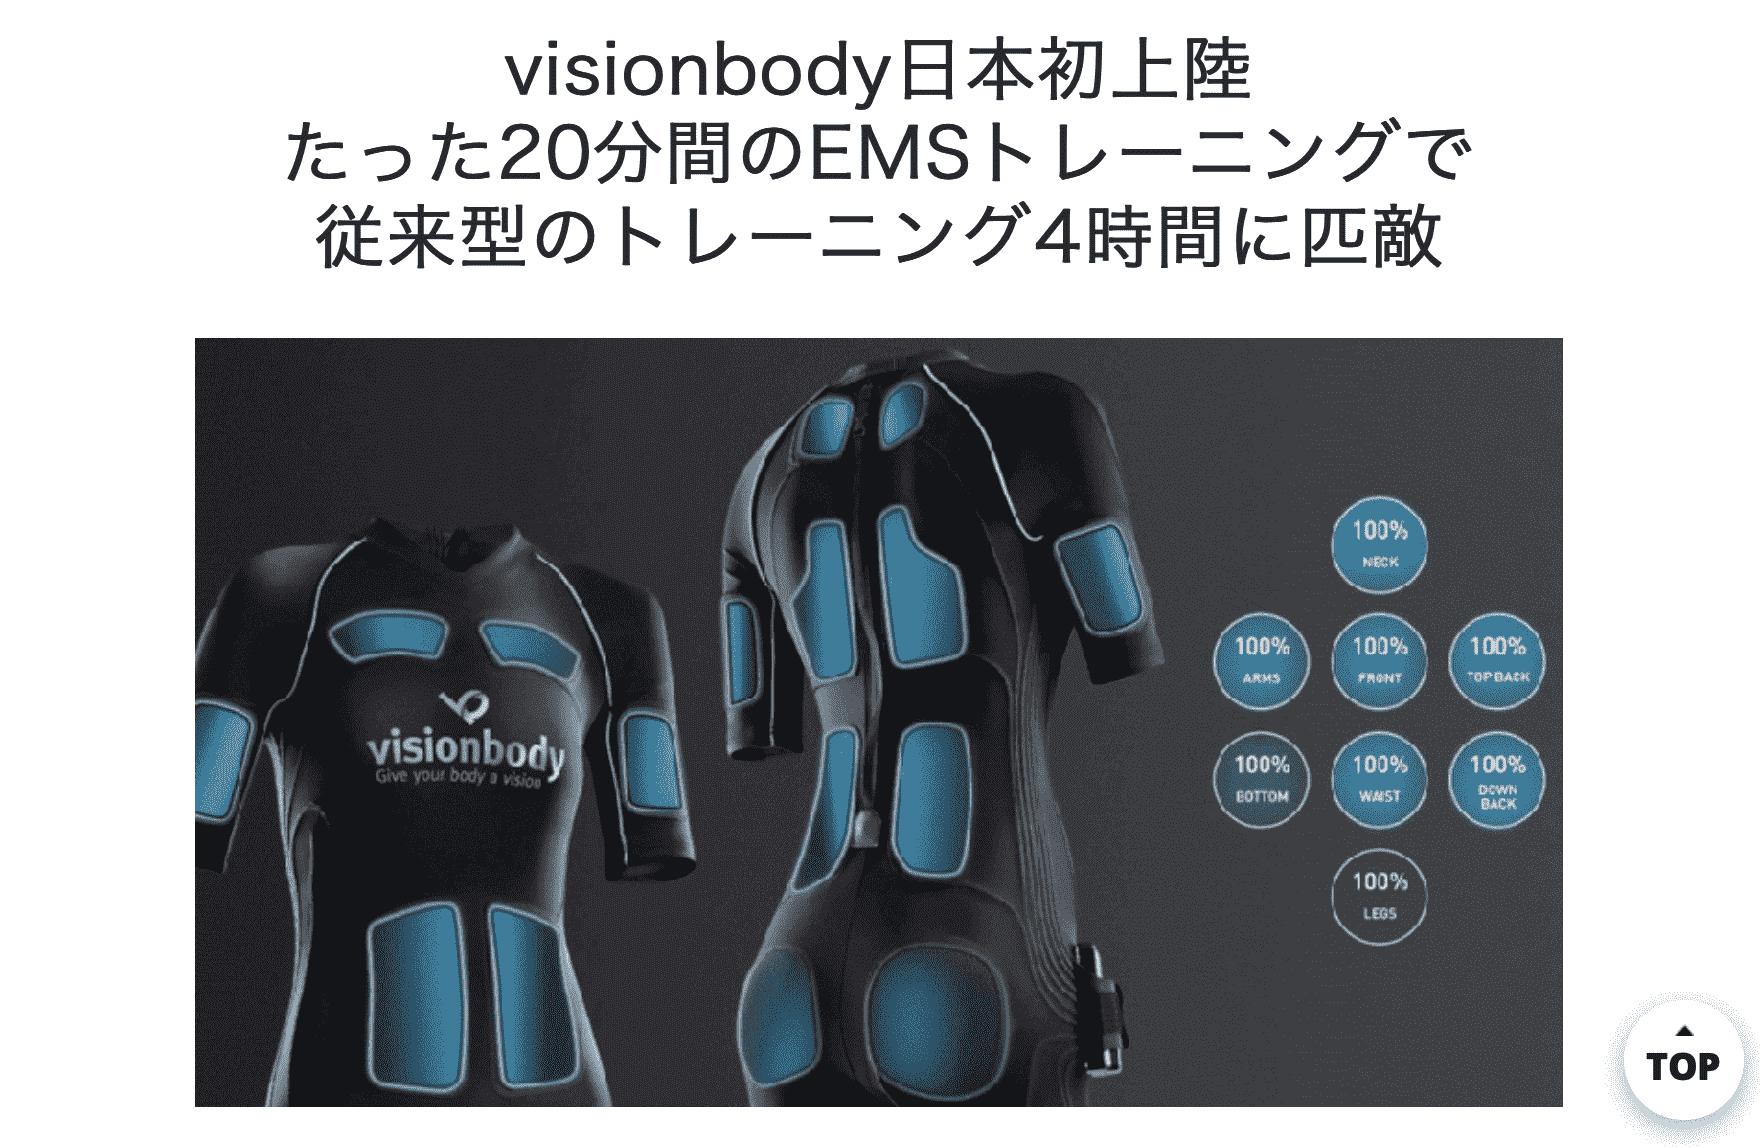 visionbody-アイキャッチ